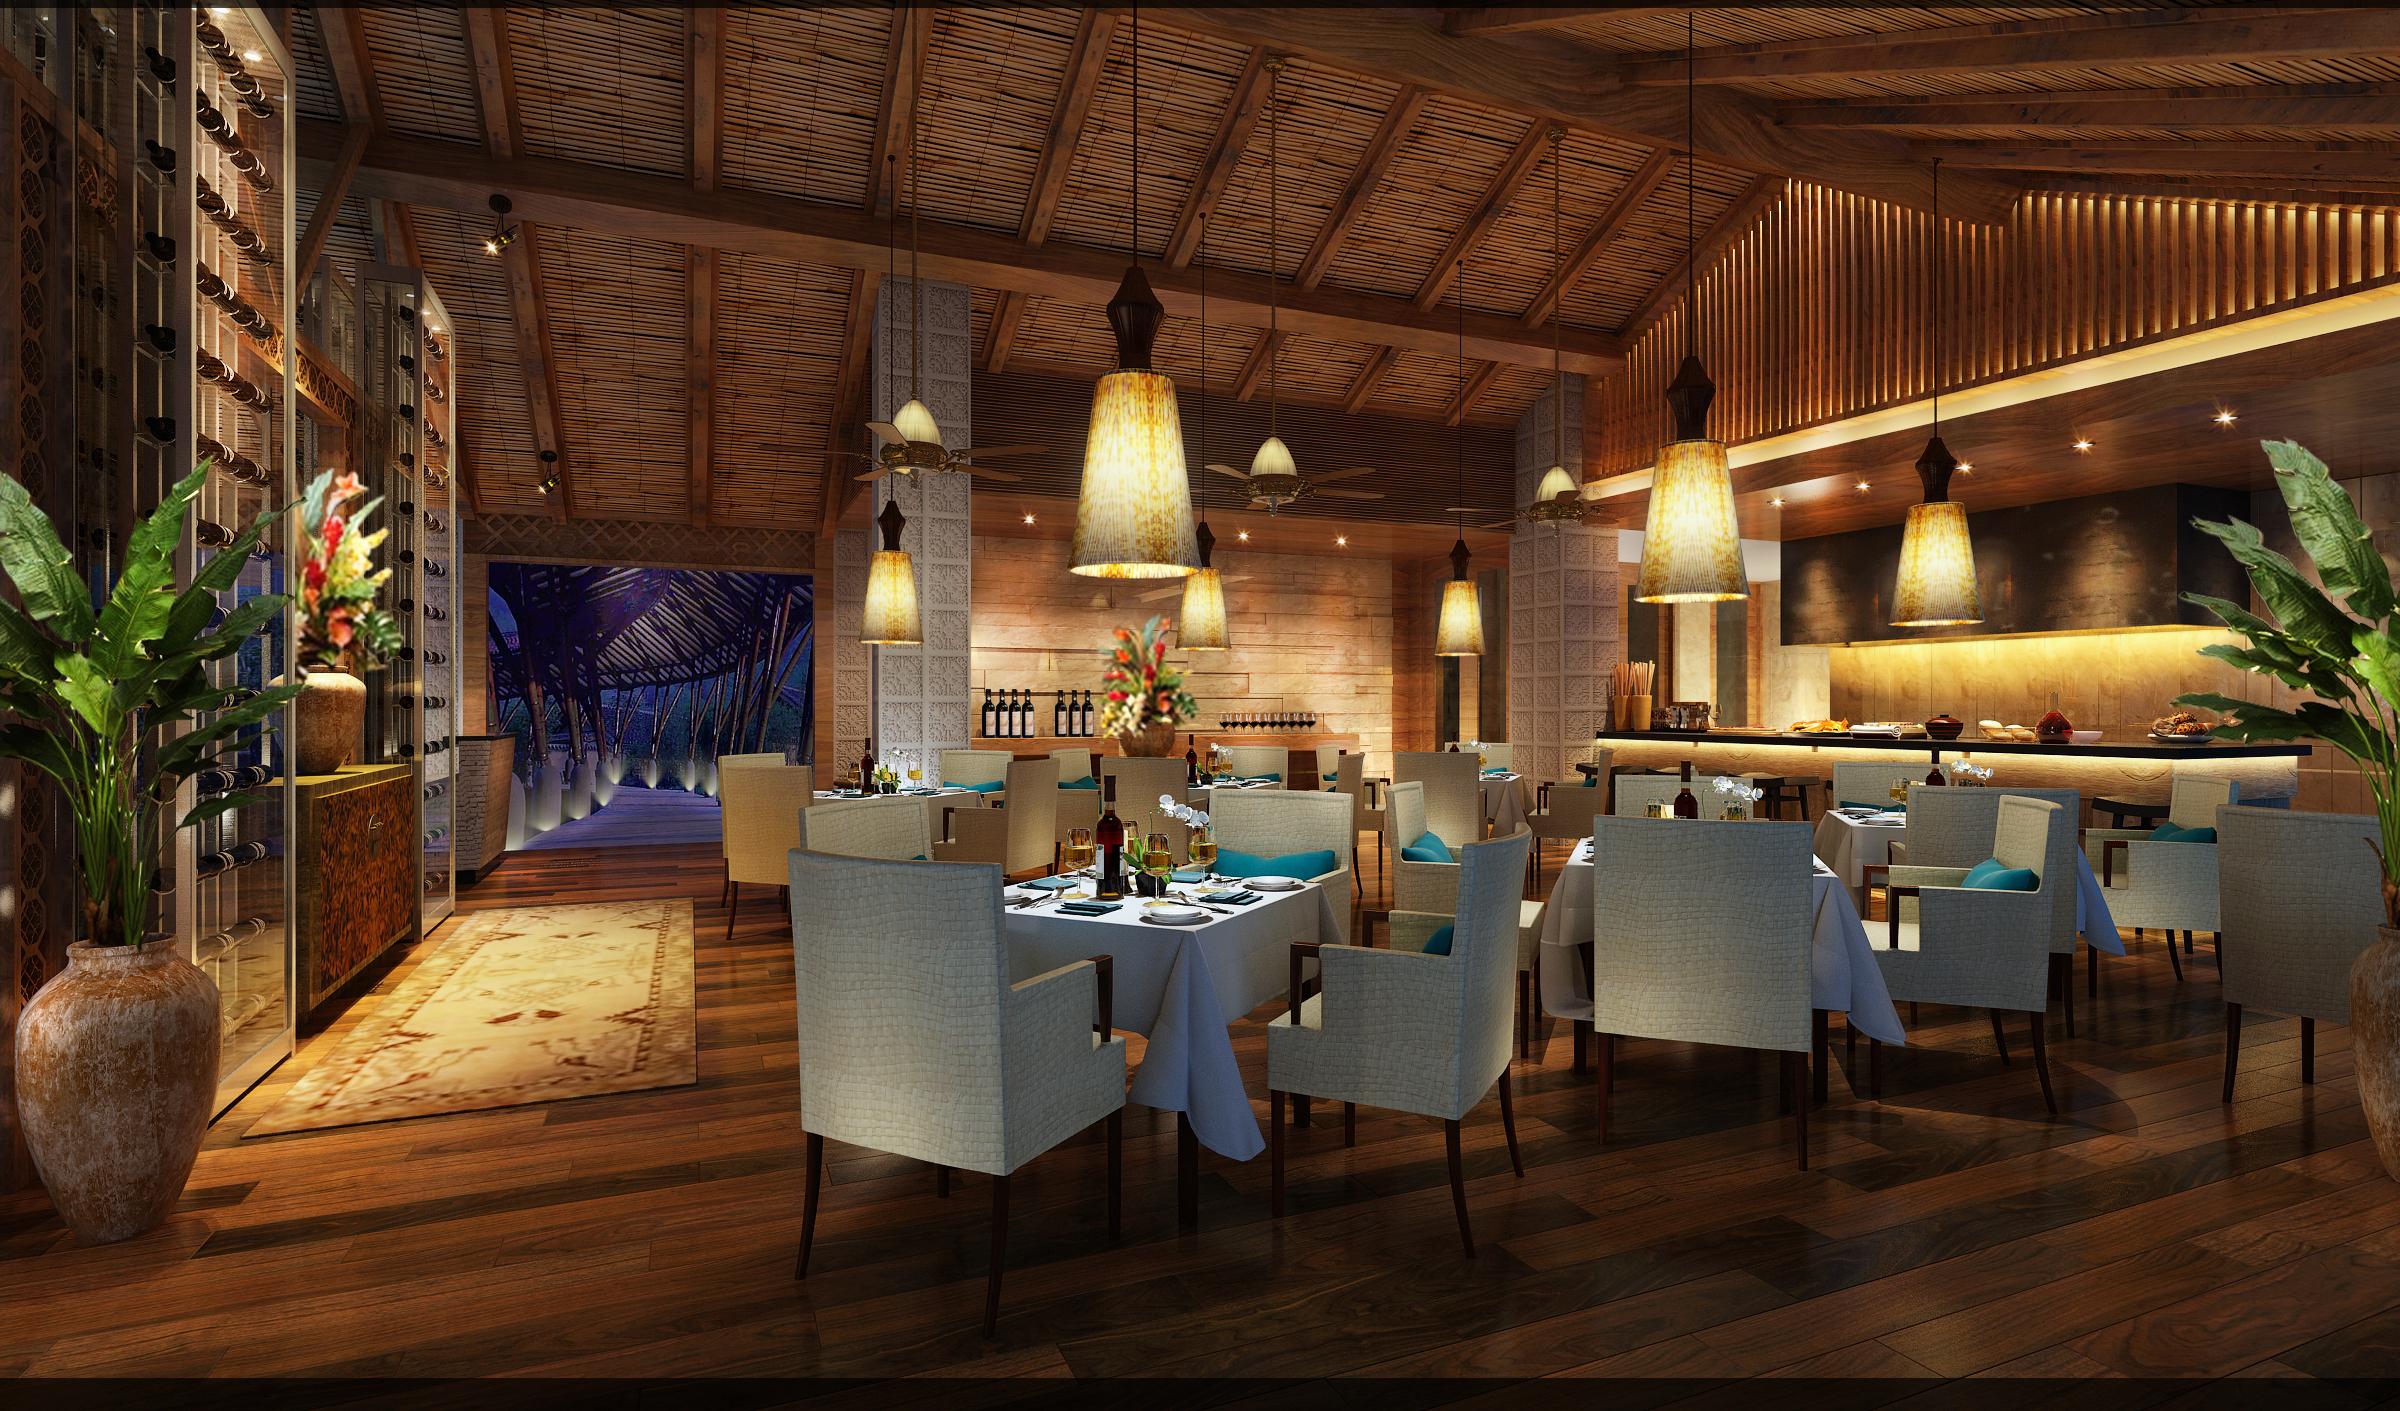 20121201-AWDA海南酒店特色餐厅-13.jpg